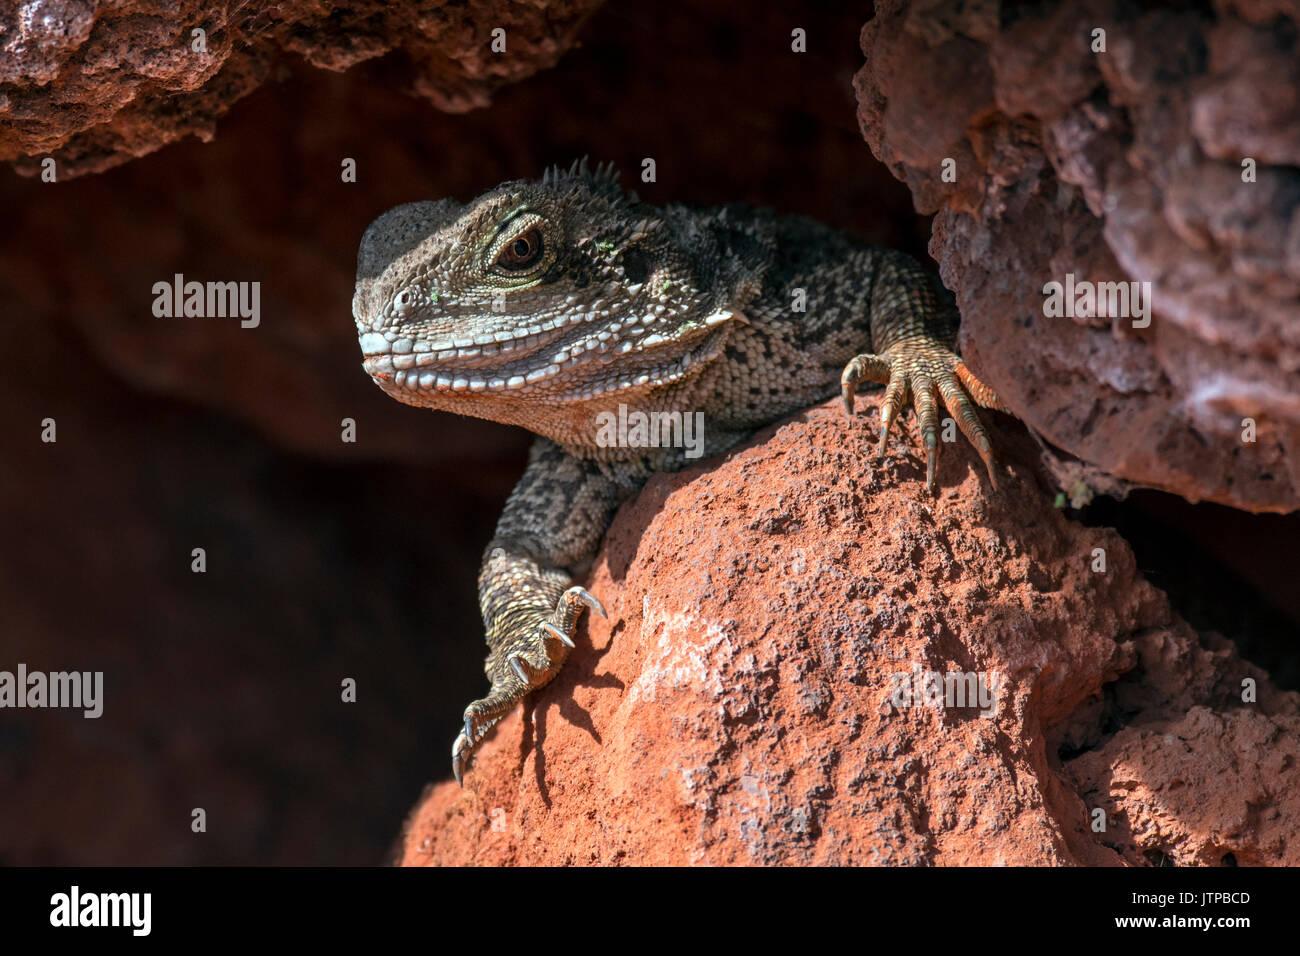 australian-water-dragon-intellagama-lesueurii-physignathus-lesueurii-JTPBCD.jpg